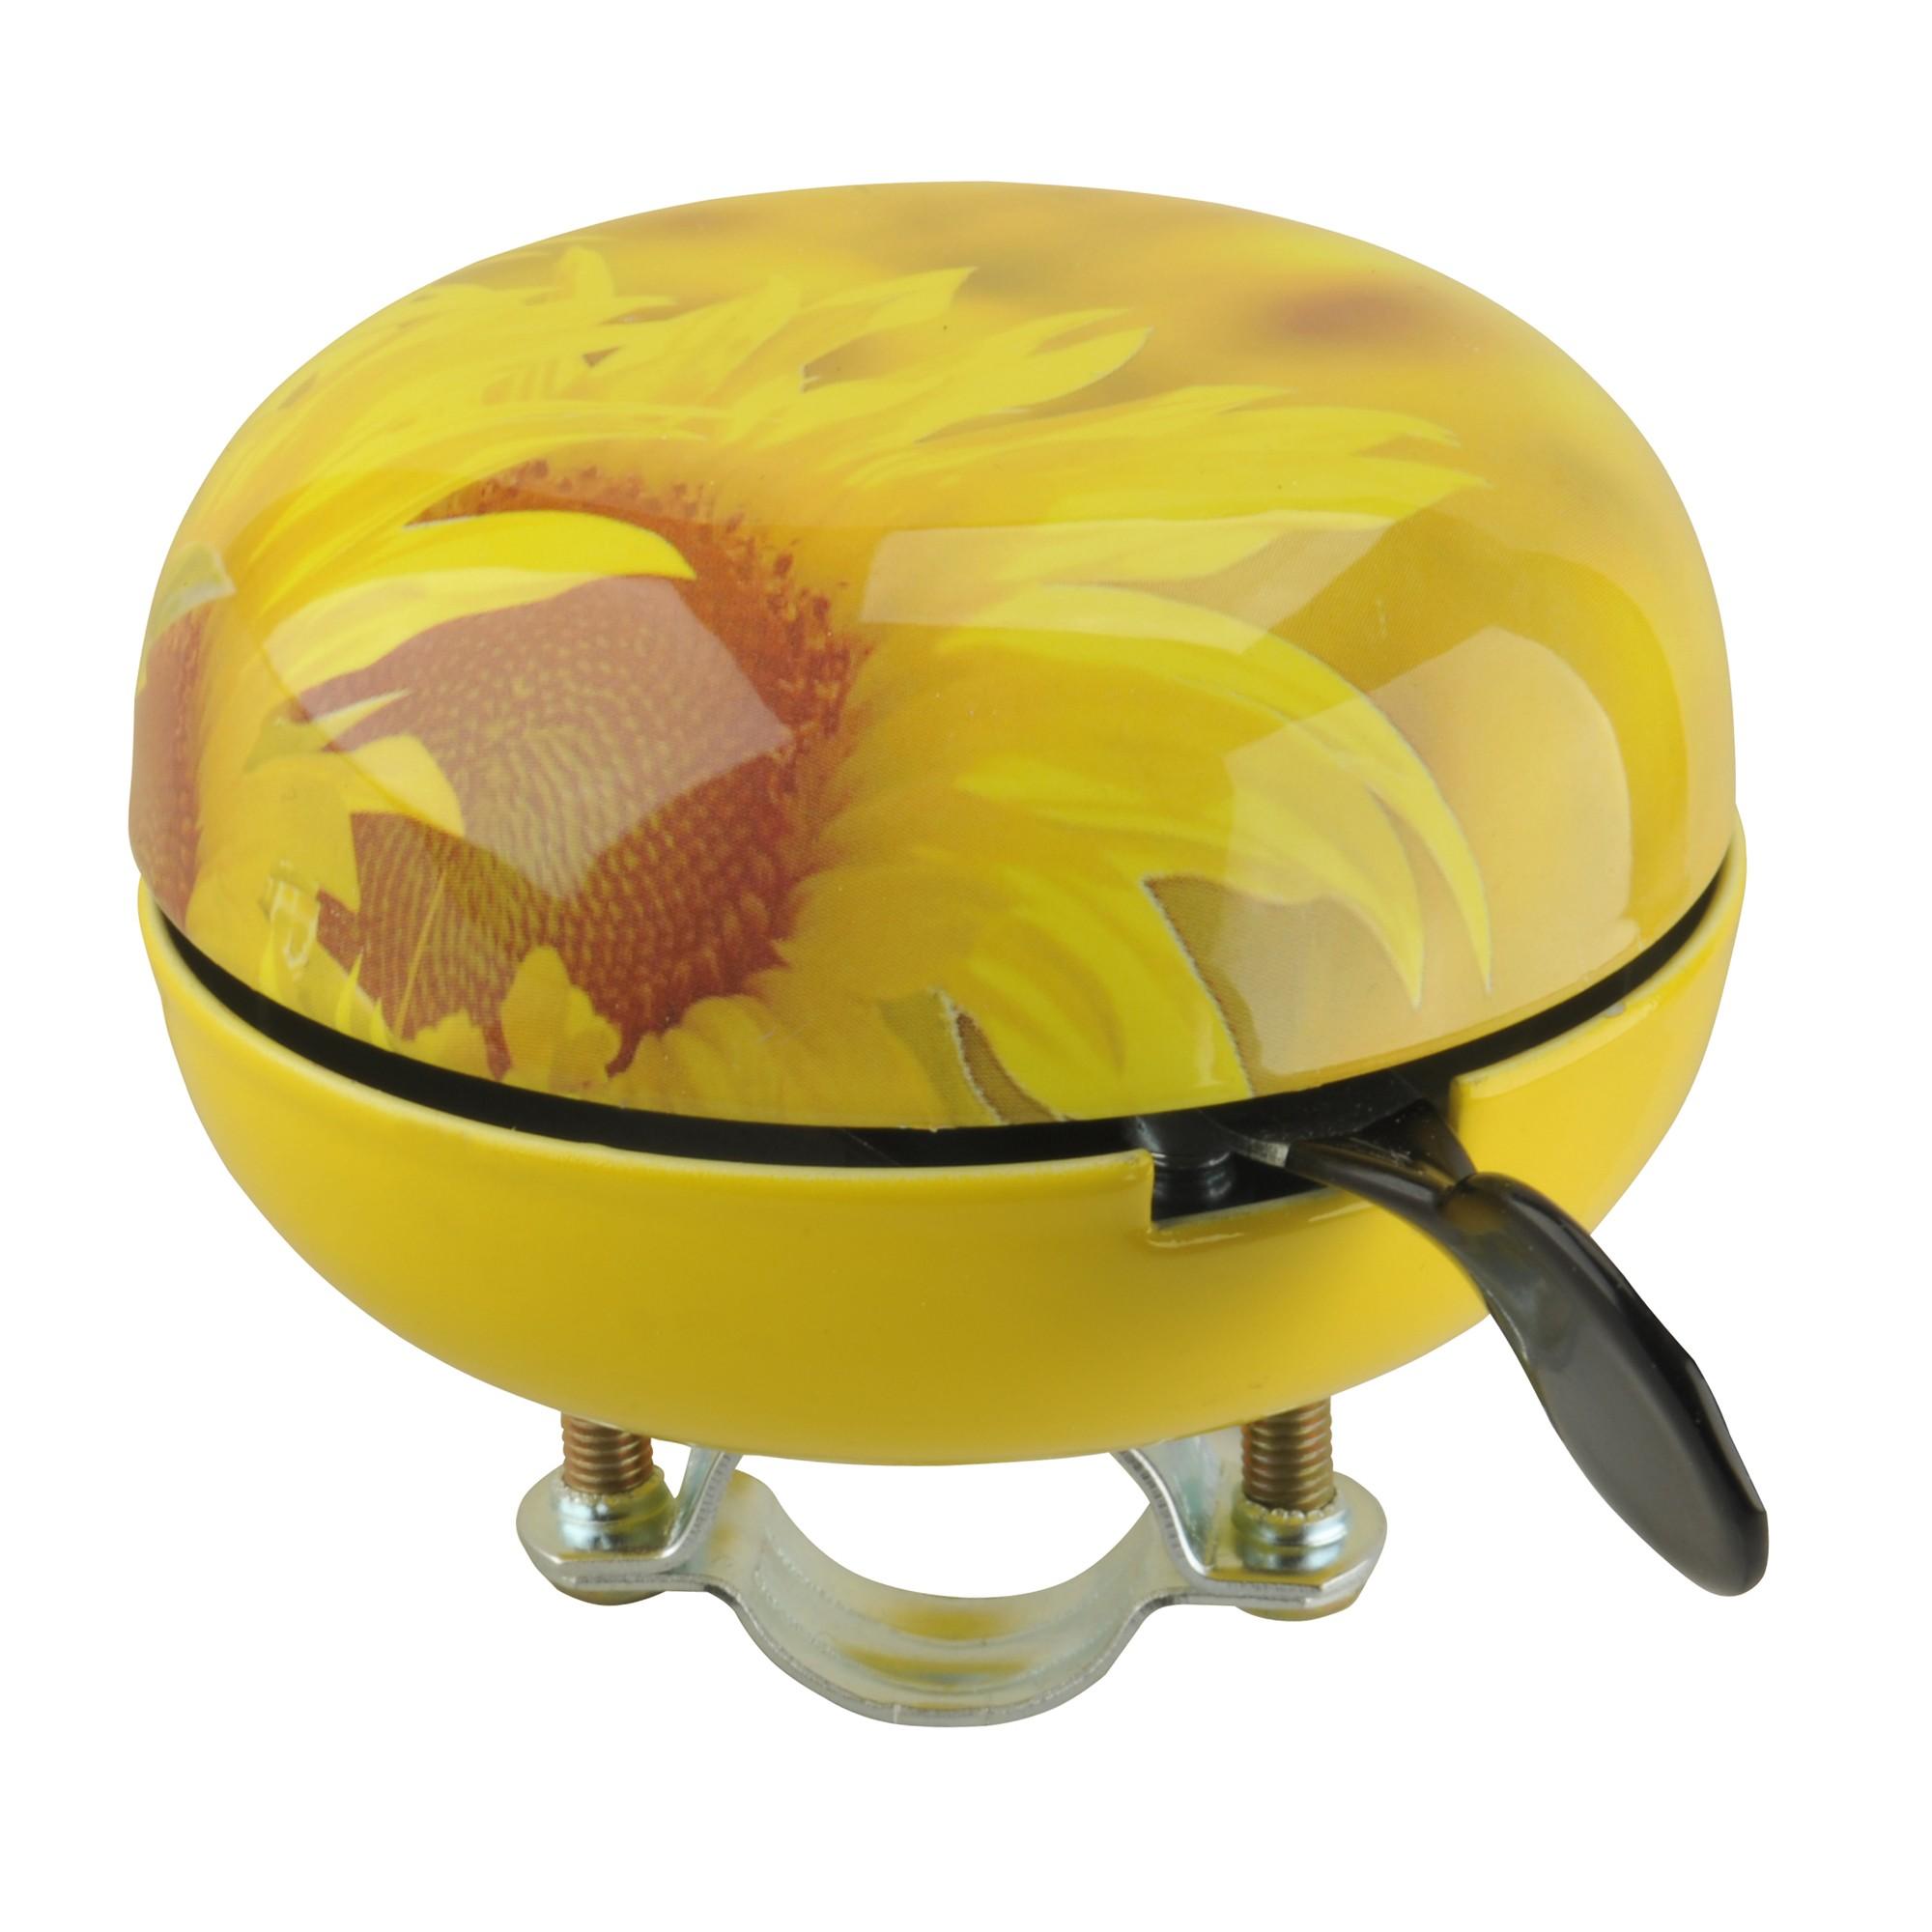 Fischer Fahrradklingel Glocke Maxi Sonnenblume Bild 1